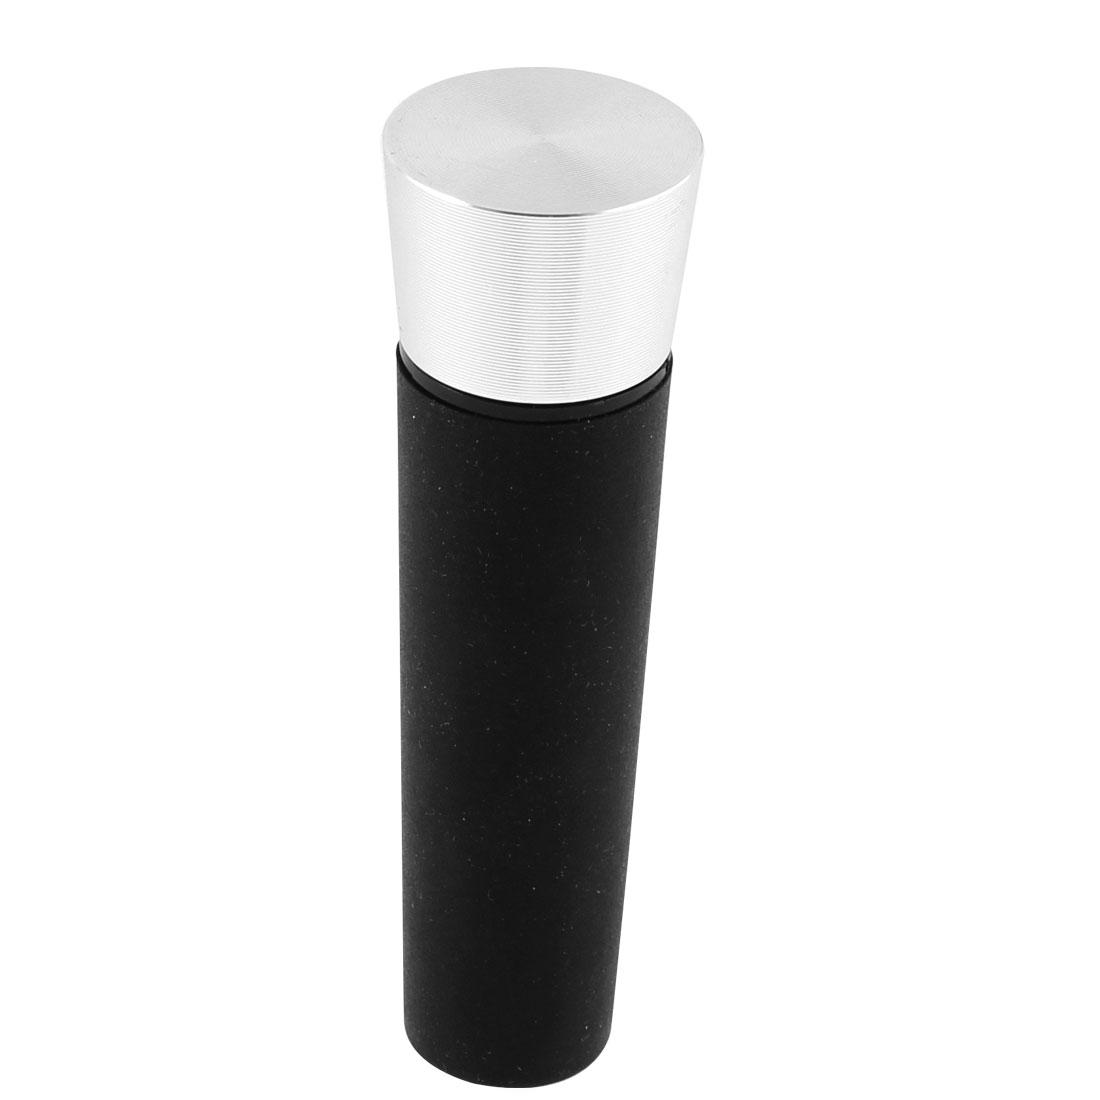 Wine Liquor Vacuum Sealed Bottle Air Pump Sealer Cap Stopper Preserver Black